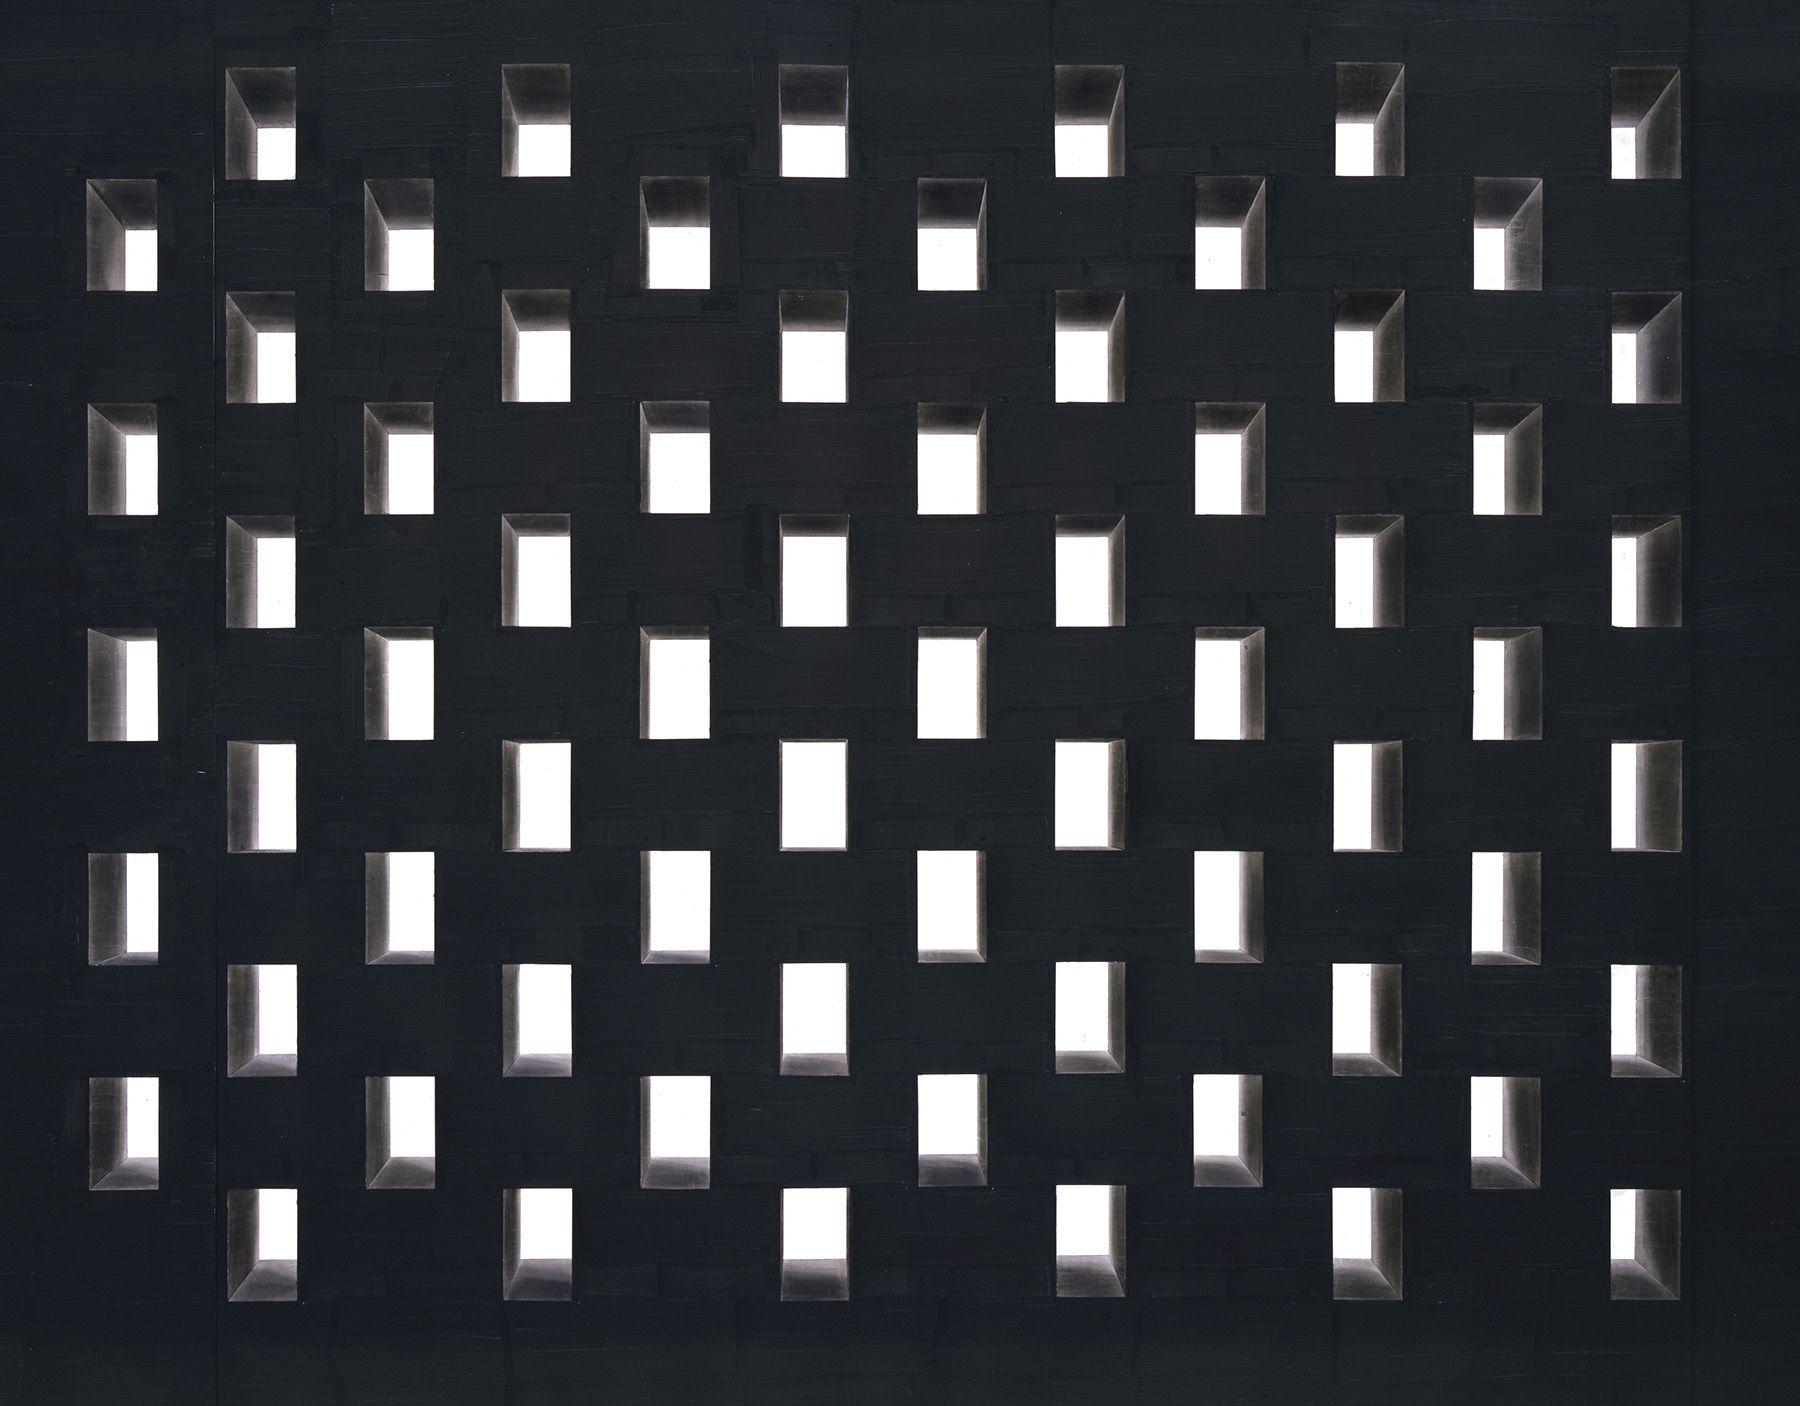 Toba Khedoori, Untitled (Black Windows) detail